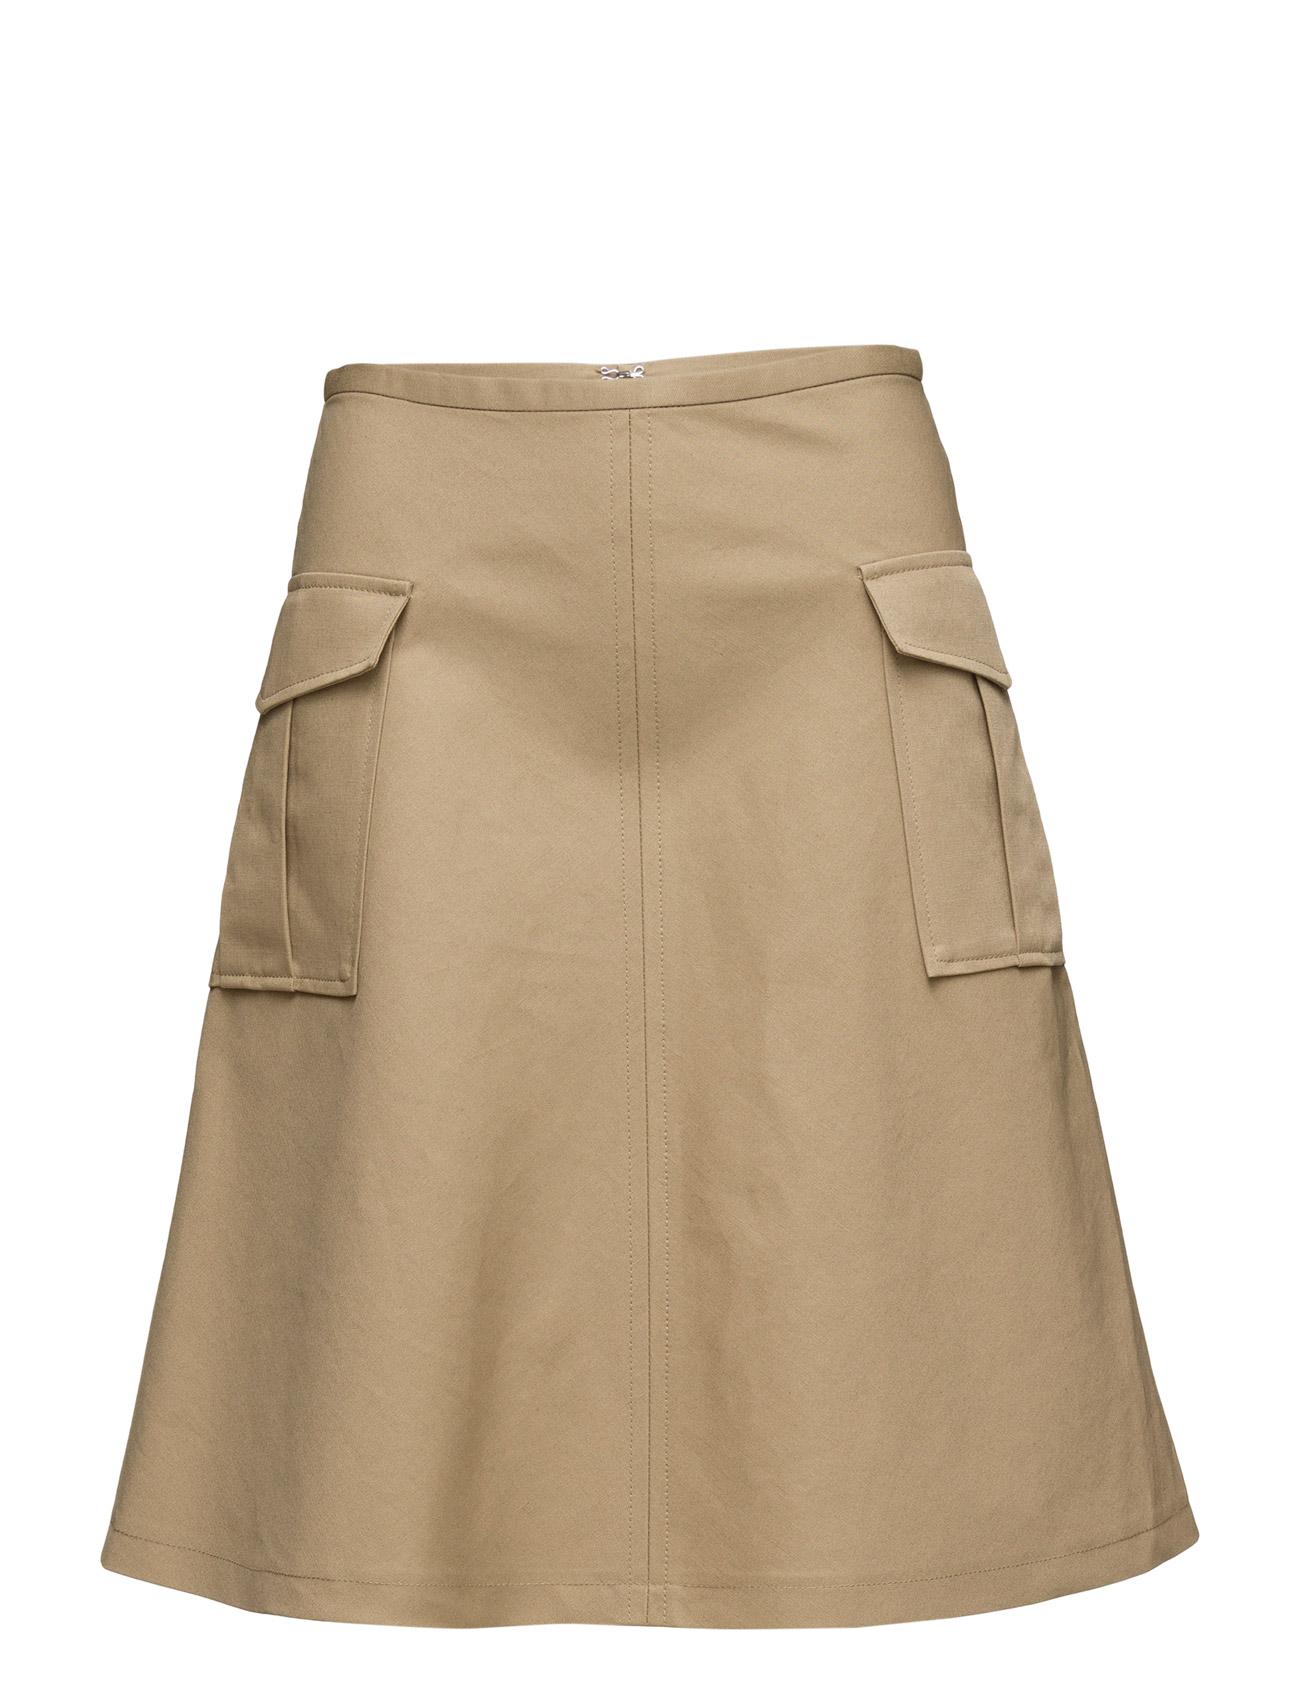 Filippa K Cotton Linen Pocket Skirt